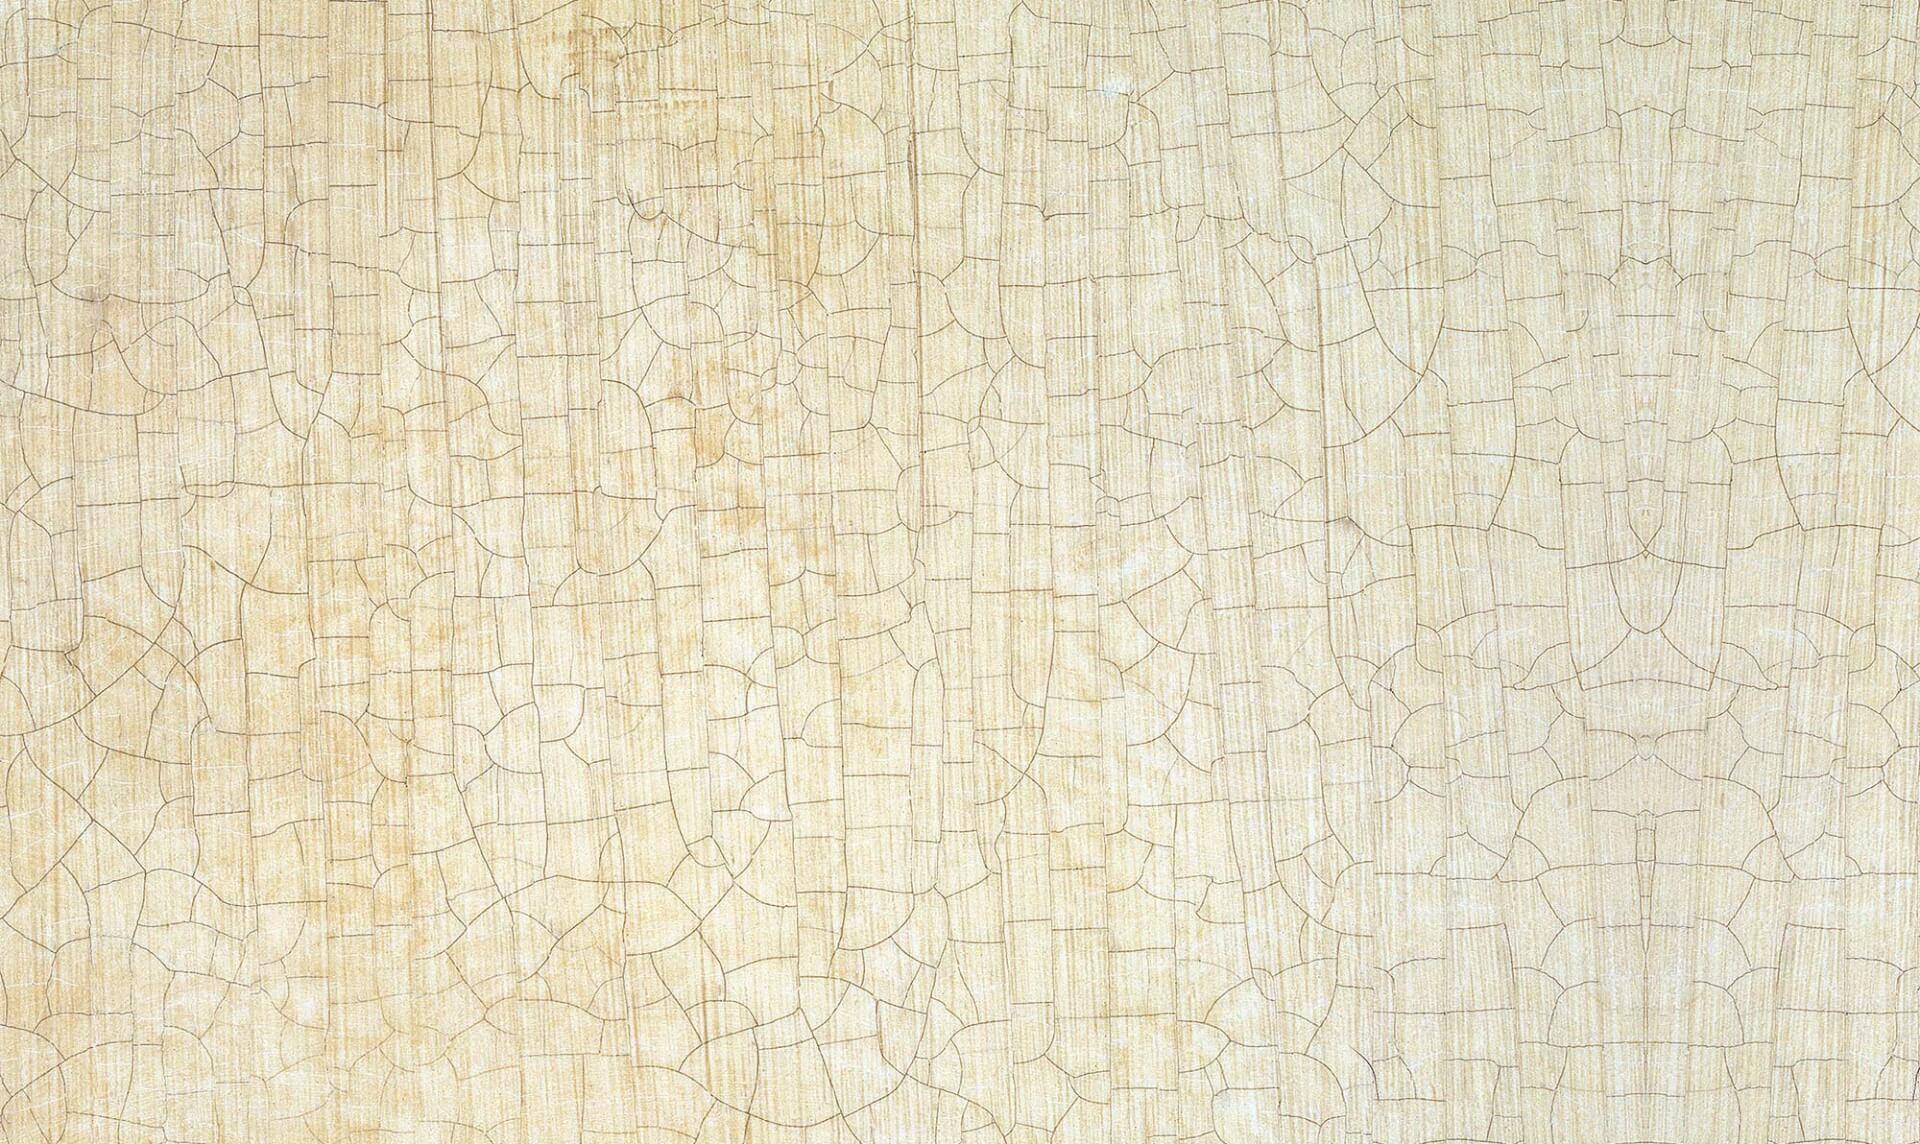 Eggshell Crackle (DE1983) Lena Fransioli Mural